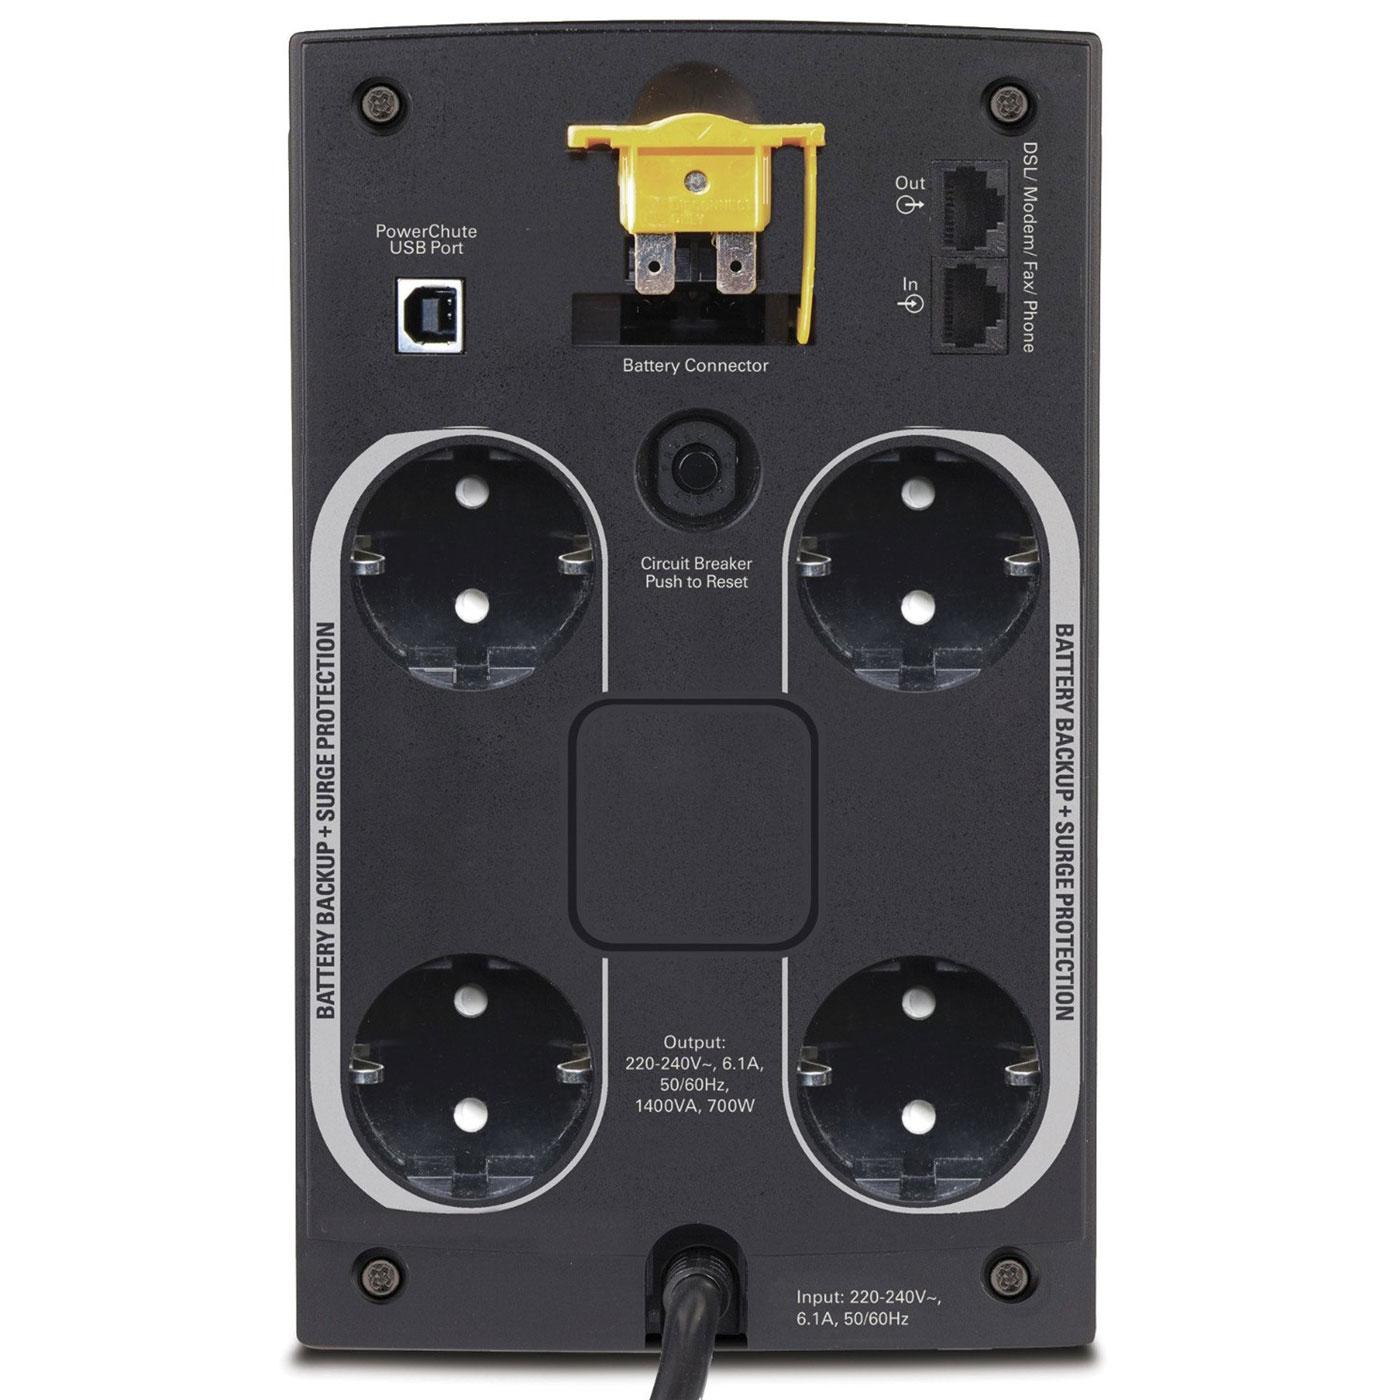 APC BX1400U-FR (BX1400U-FR) - Achat / Vente Onduleur - Multiprises sur Cybertek.fr - 1